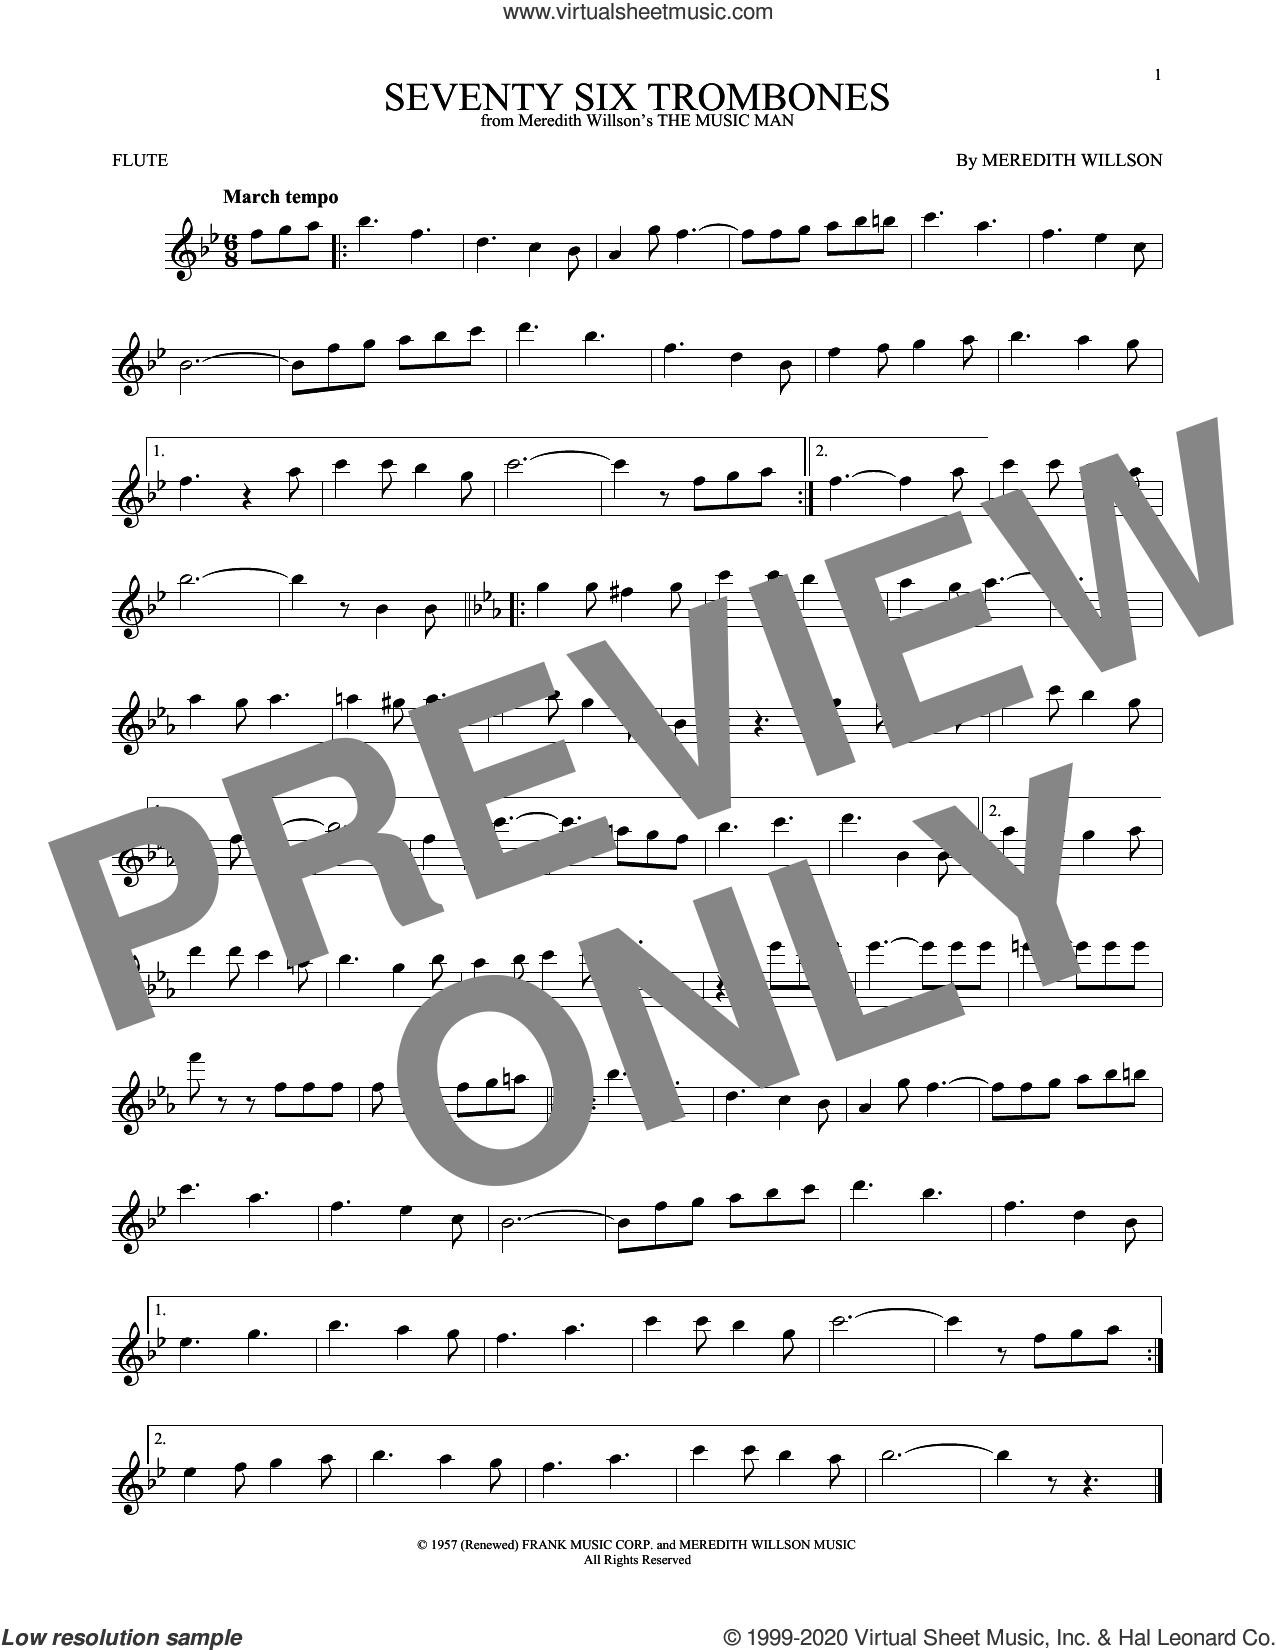 Seventy Six Trombones sheet music for flute solo by Meredith Willson, intermediate skill level